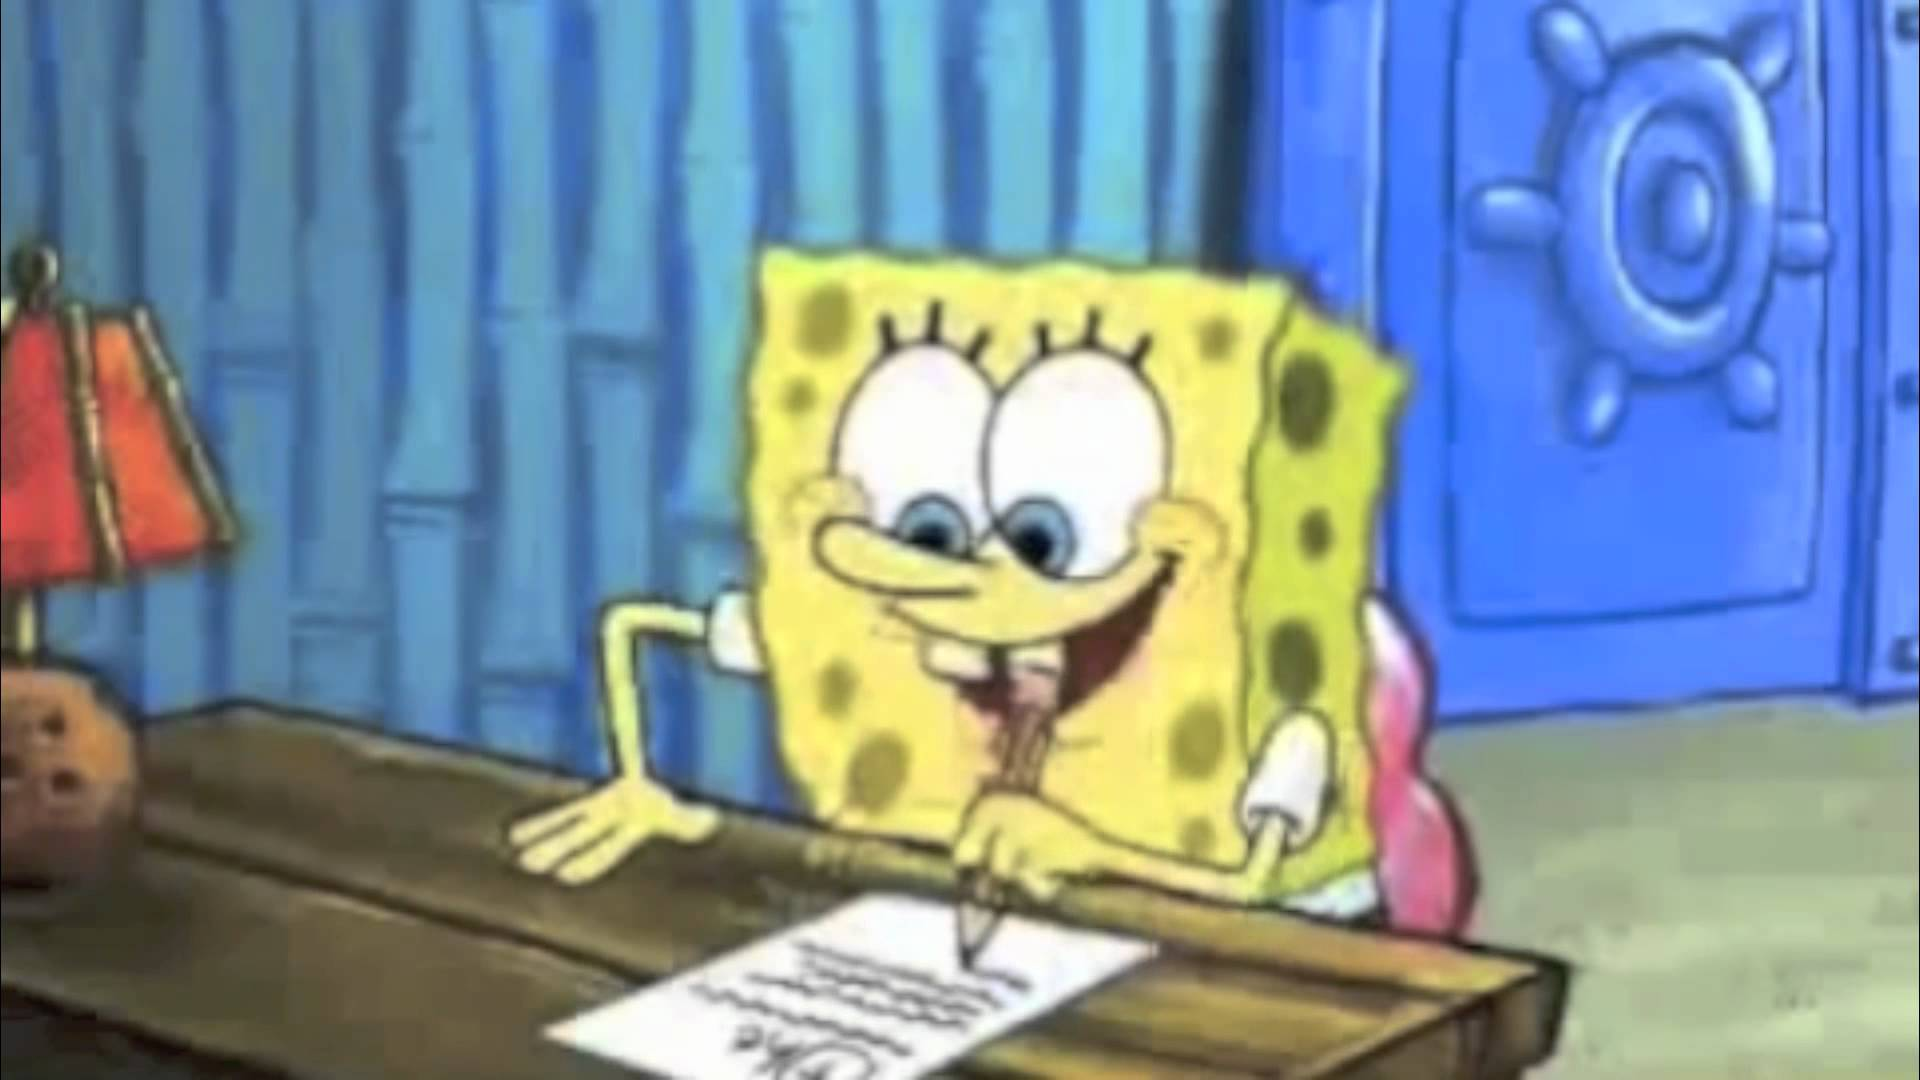 019 Spongebob Writing His Essay Help For Hours Maxresde Gif The Rap Font Meme Stirring Generator Full